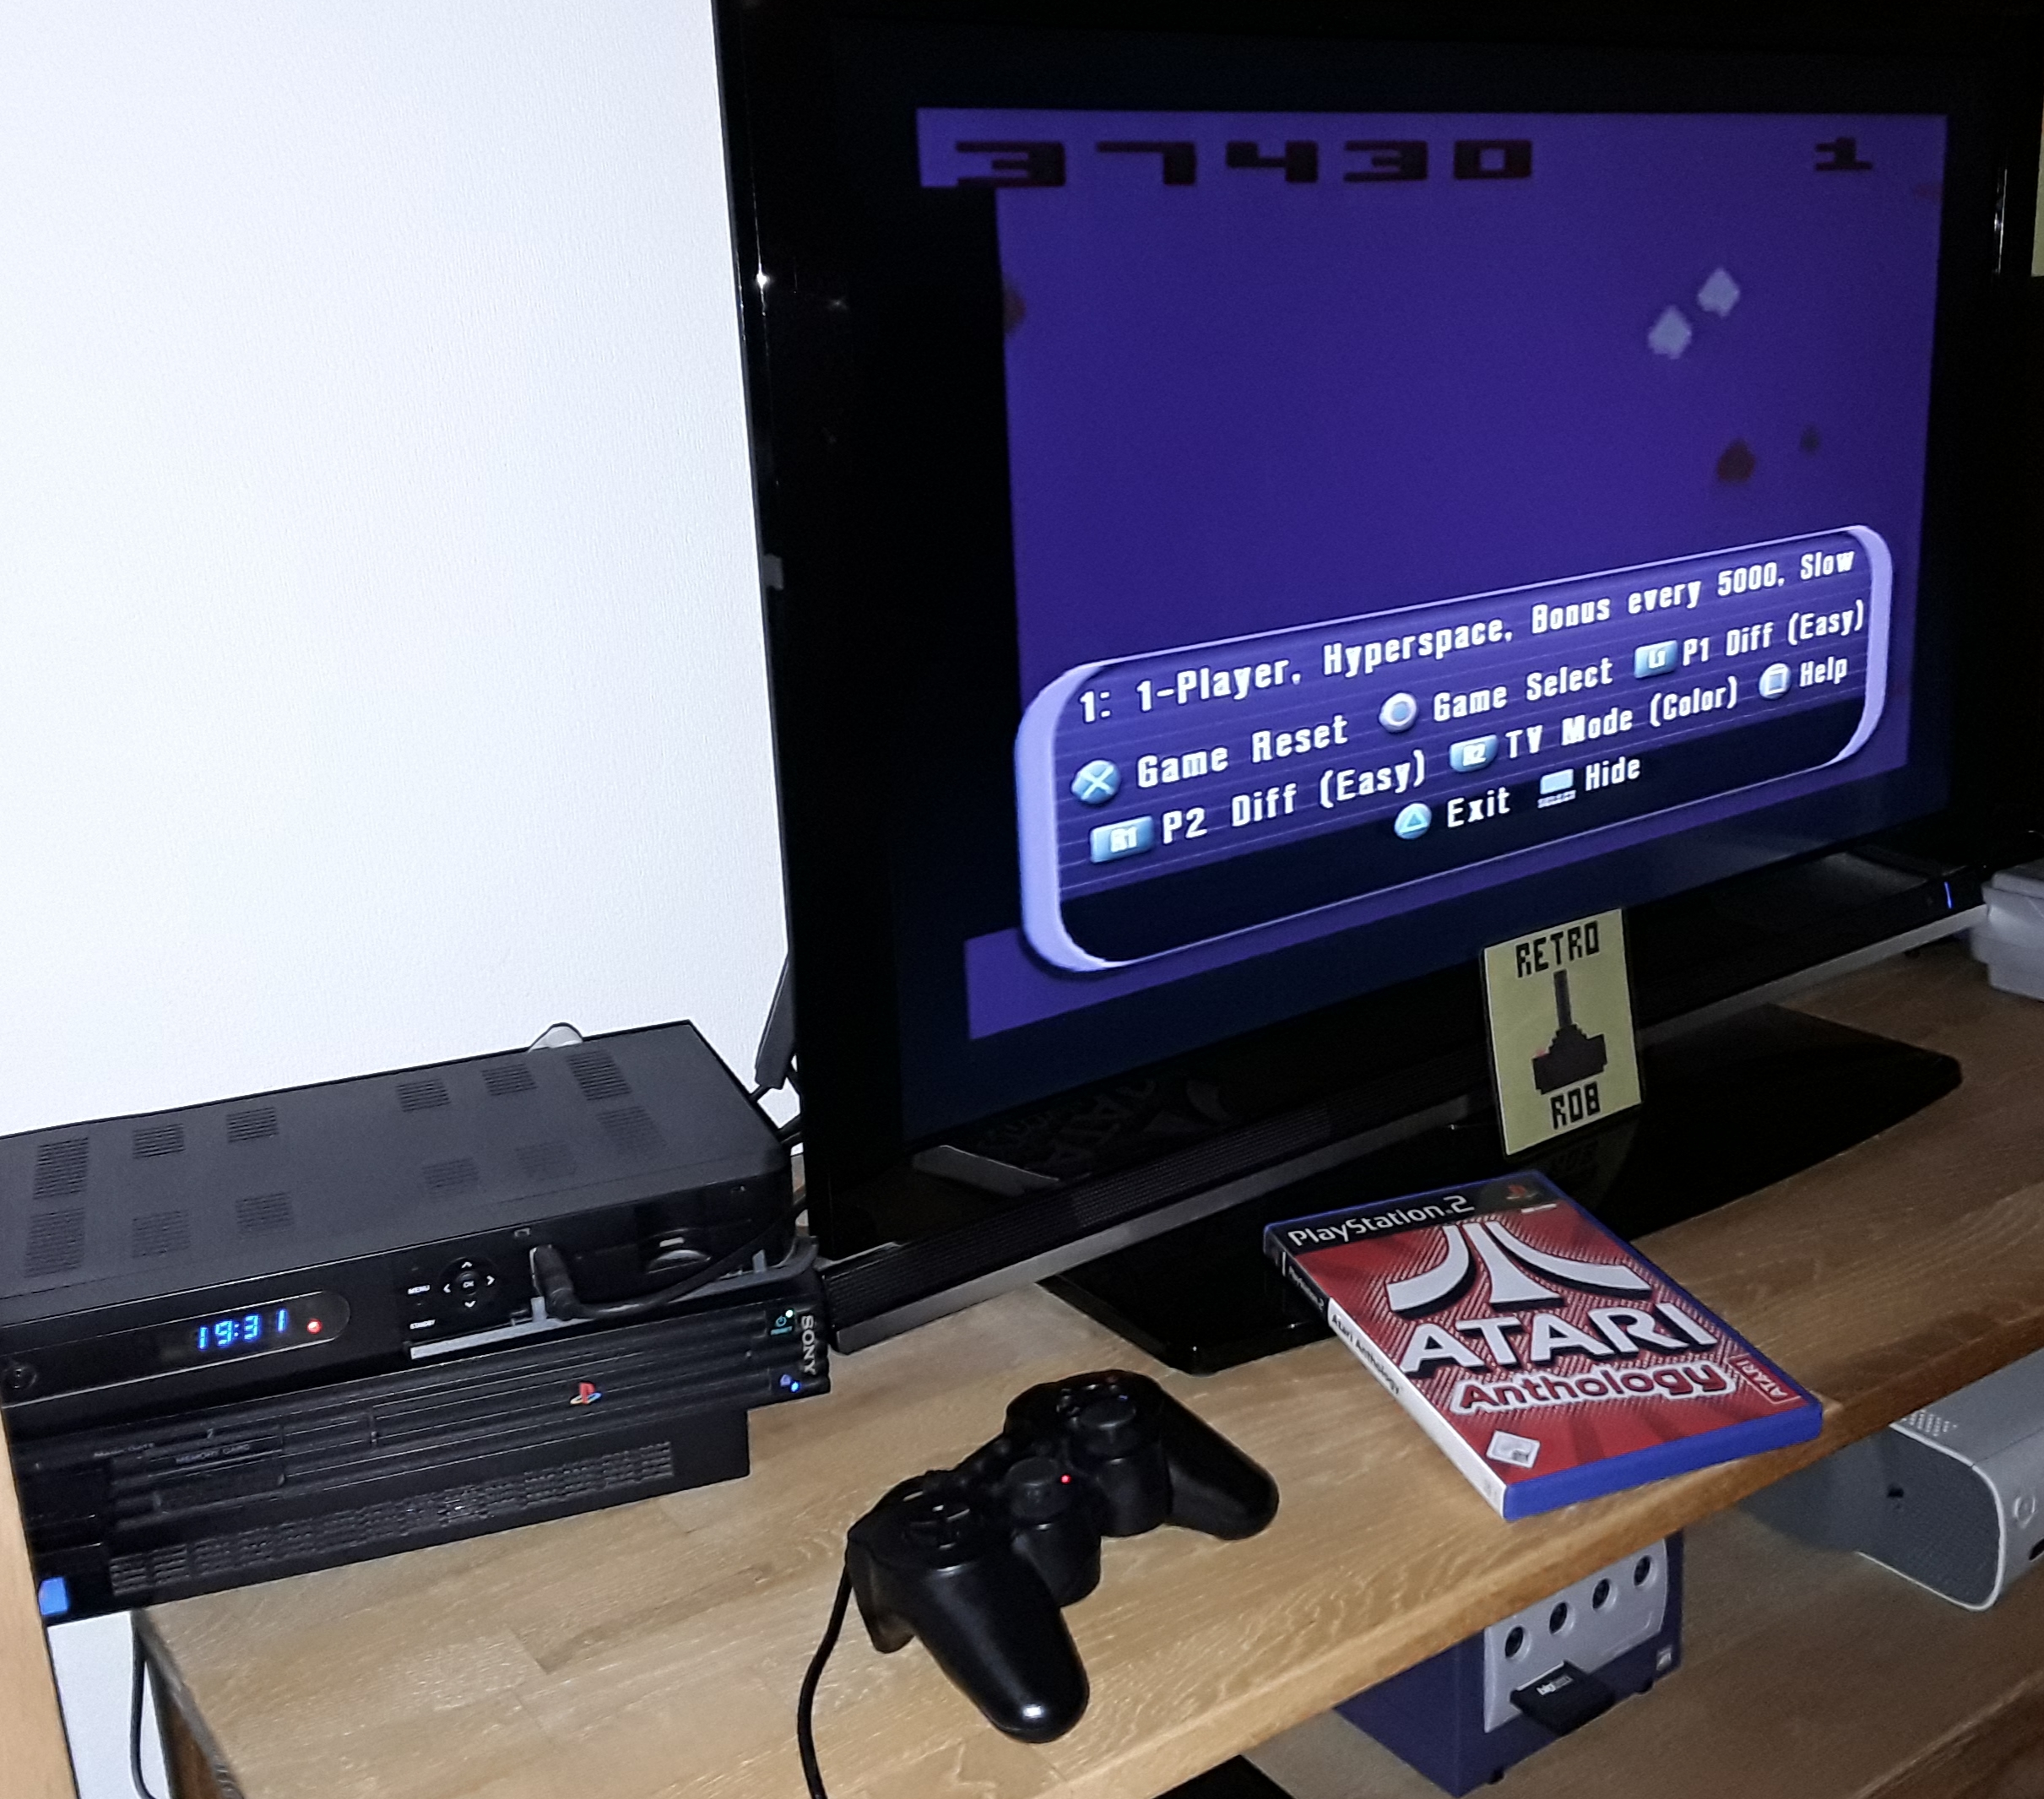 RetroRob: Atari Anthology: Asteroids - home version [Game 1B] (Playstation 2) 37,430 points on 2019-01-16 12:29:10